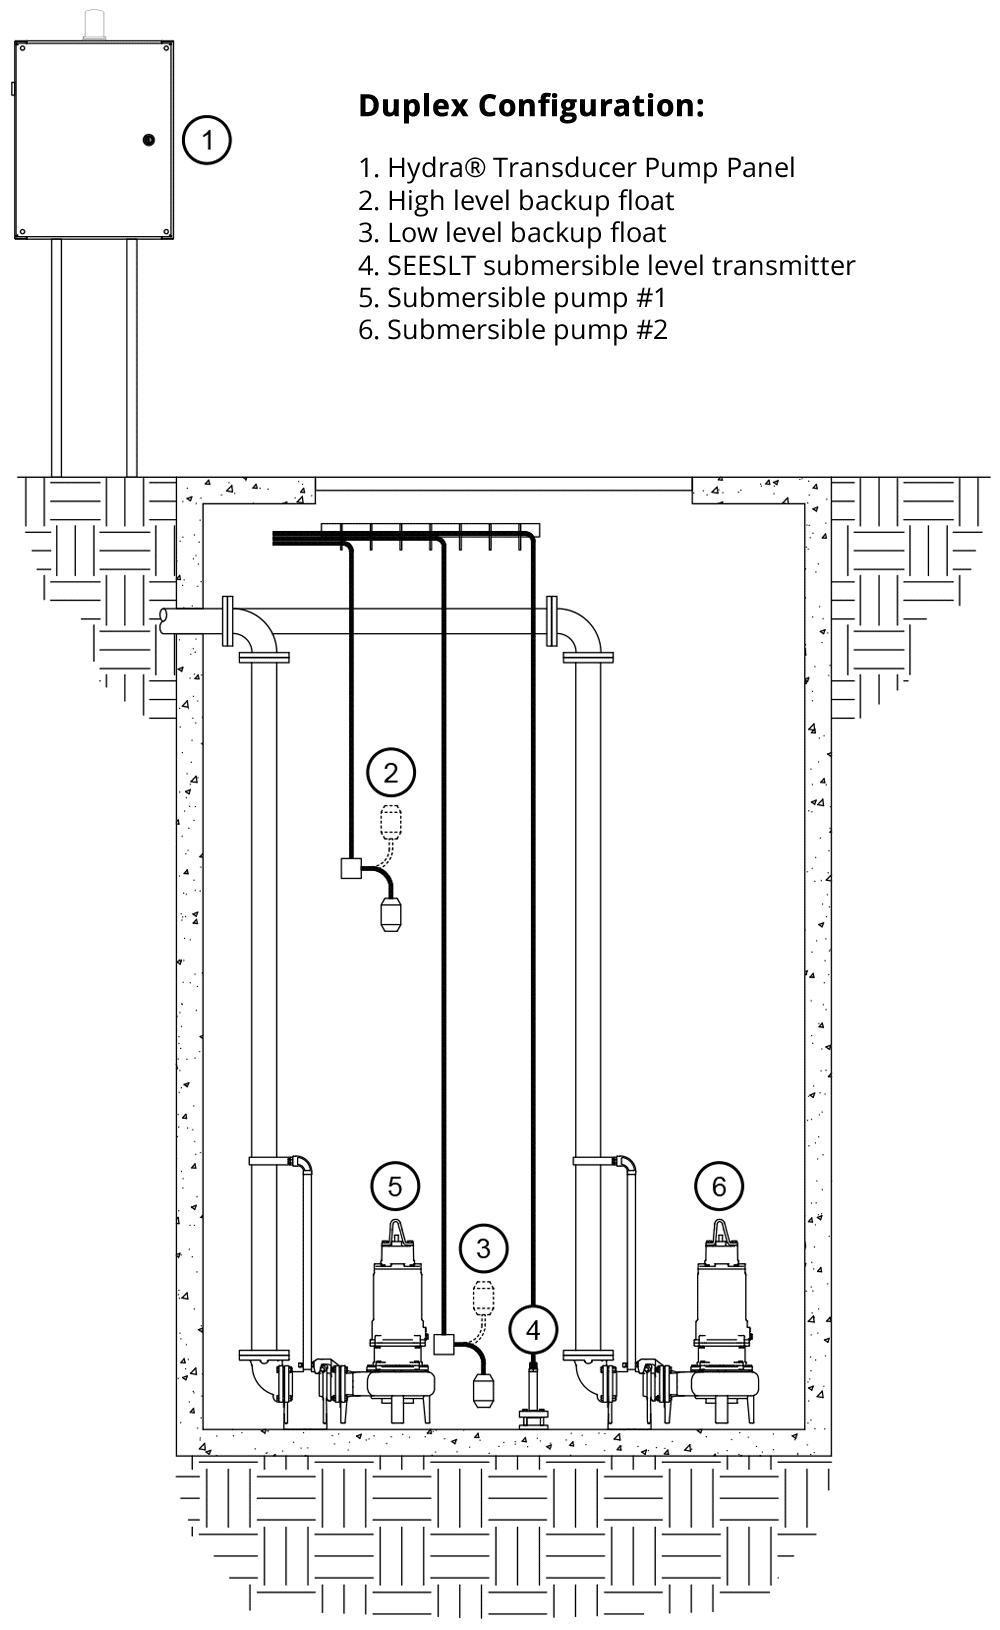 CG_7498] Lift Station Wiring Furthermore Sje Rhombus Pump Control Panel  Wiring Download DiagramFrag Teria Unre Garna Mohammedshrine Librar Wiring 101